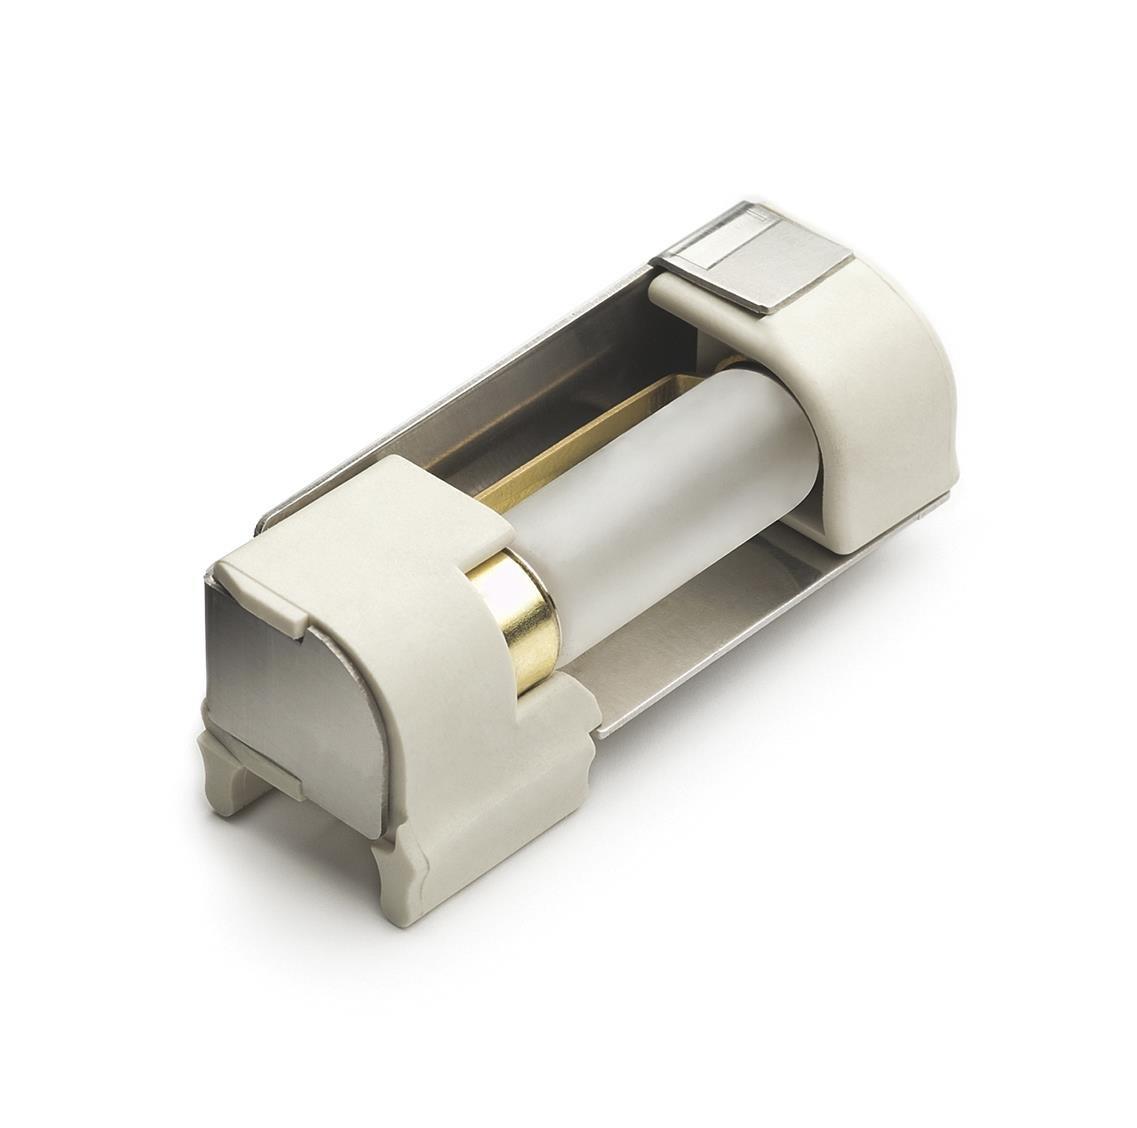 Kichler 10217WH Linear Frosted White Socket 24V/5W, White by KICHLER (Image #1)